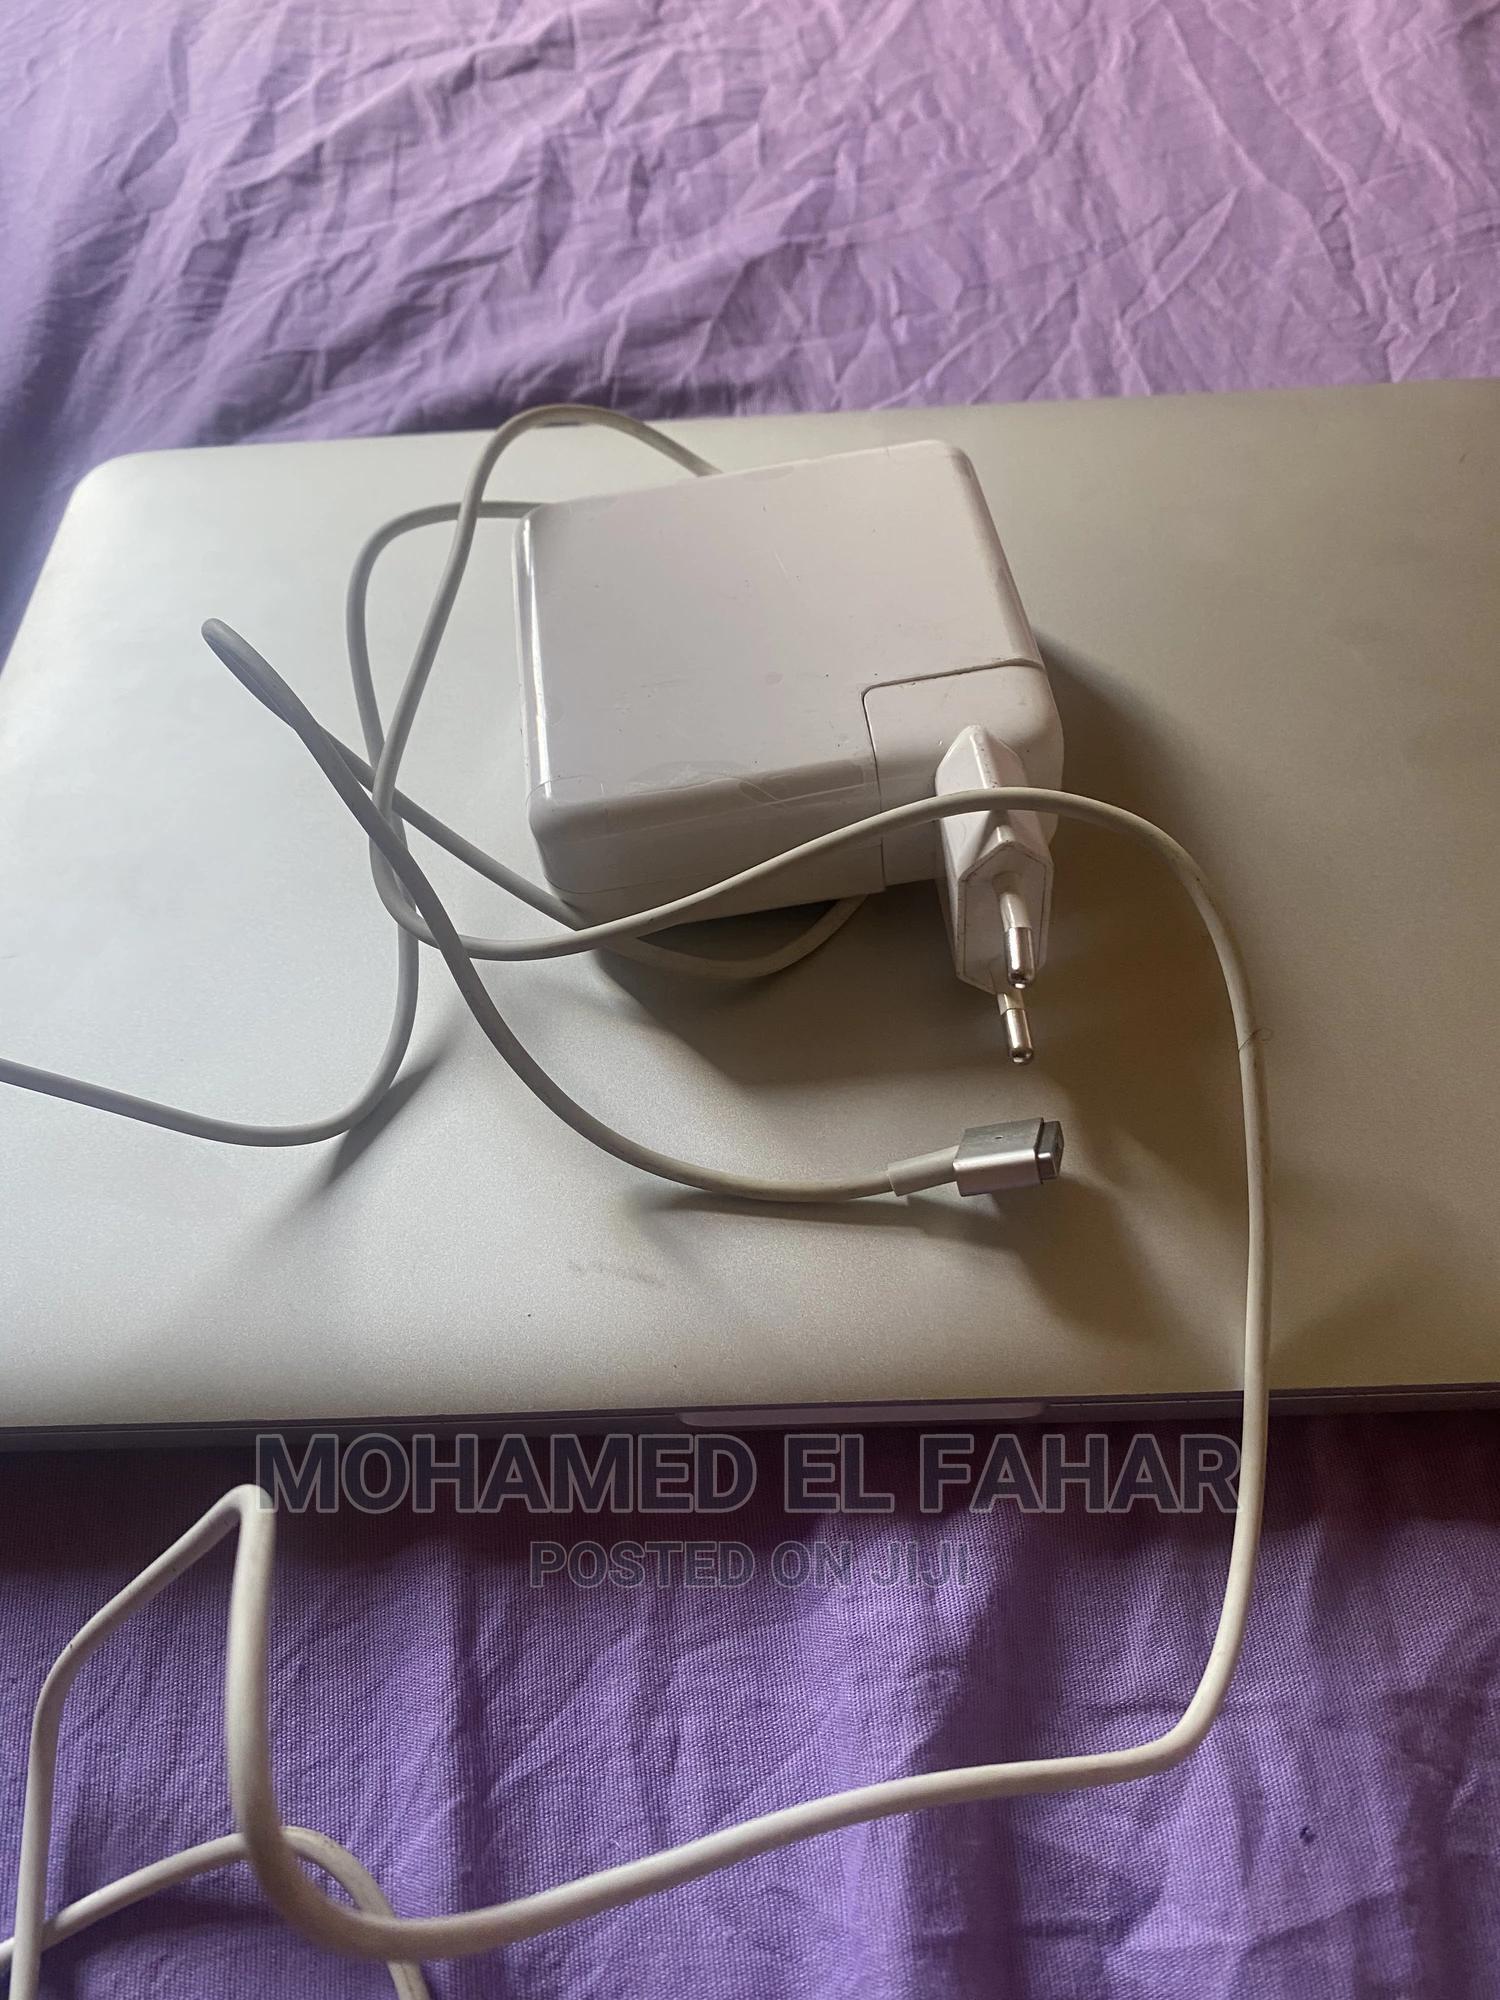 Archive: Laptop Apple MacBook 2014 8GB Intel Core I5 SSD 250GB